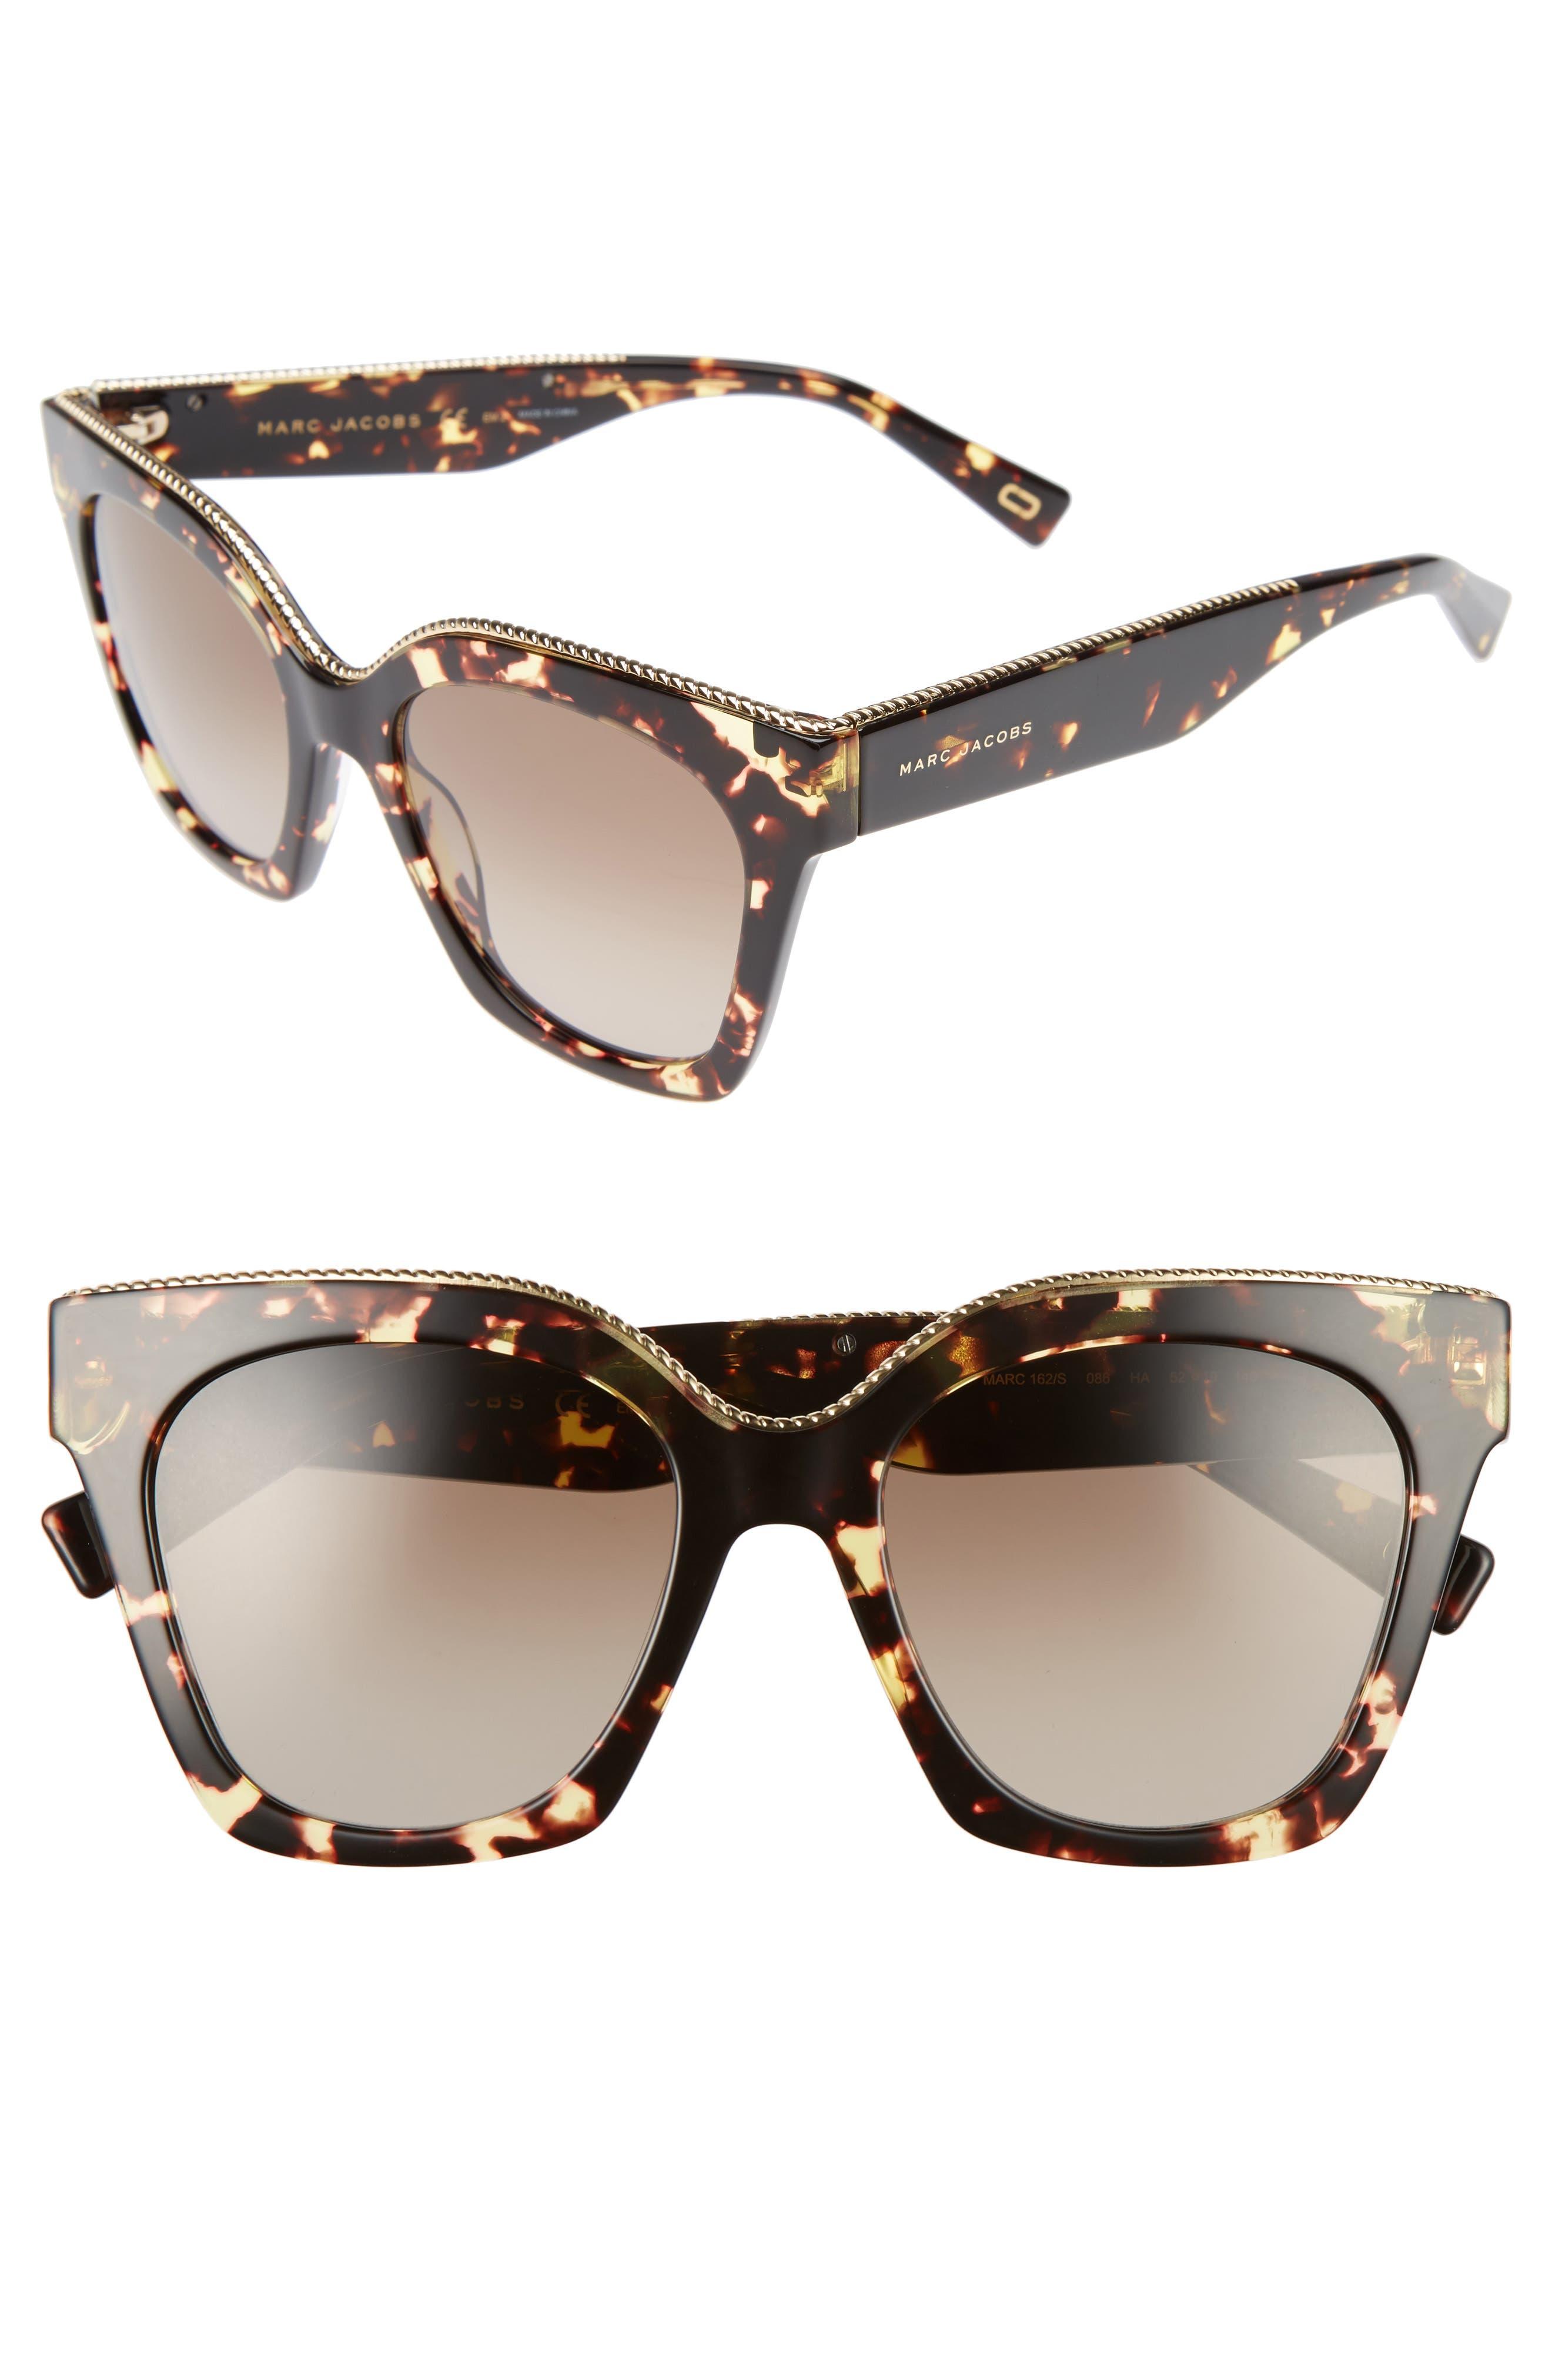 MARC JACOBS 52mm Square Sunglasses